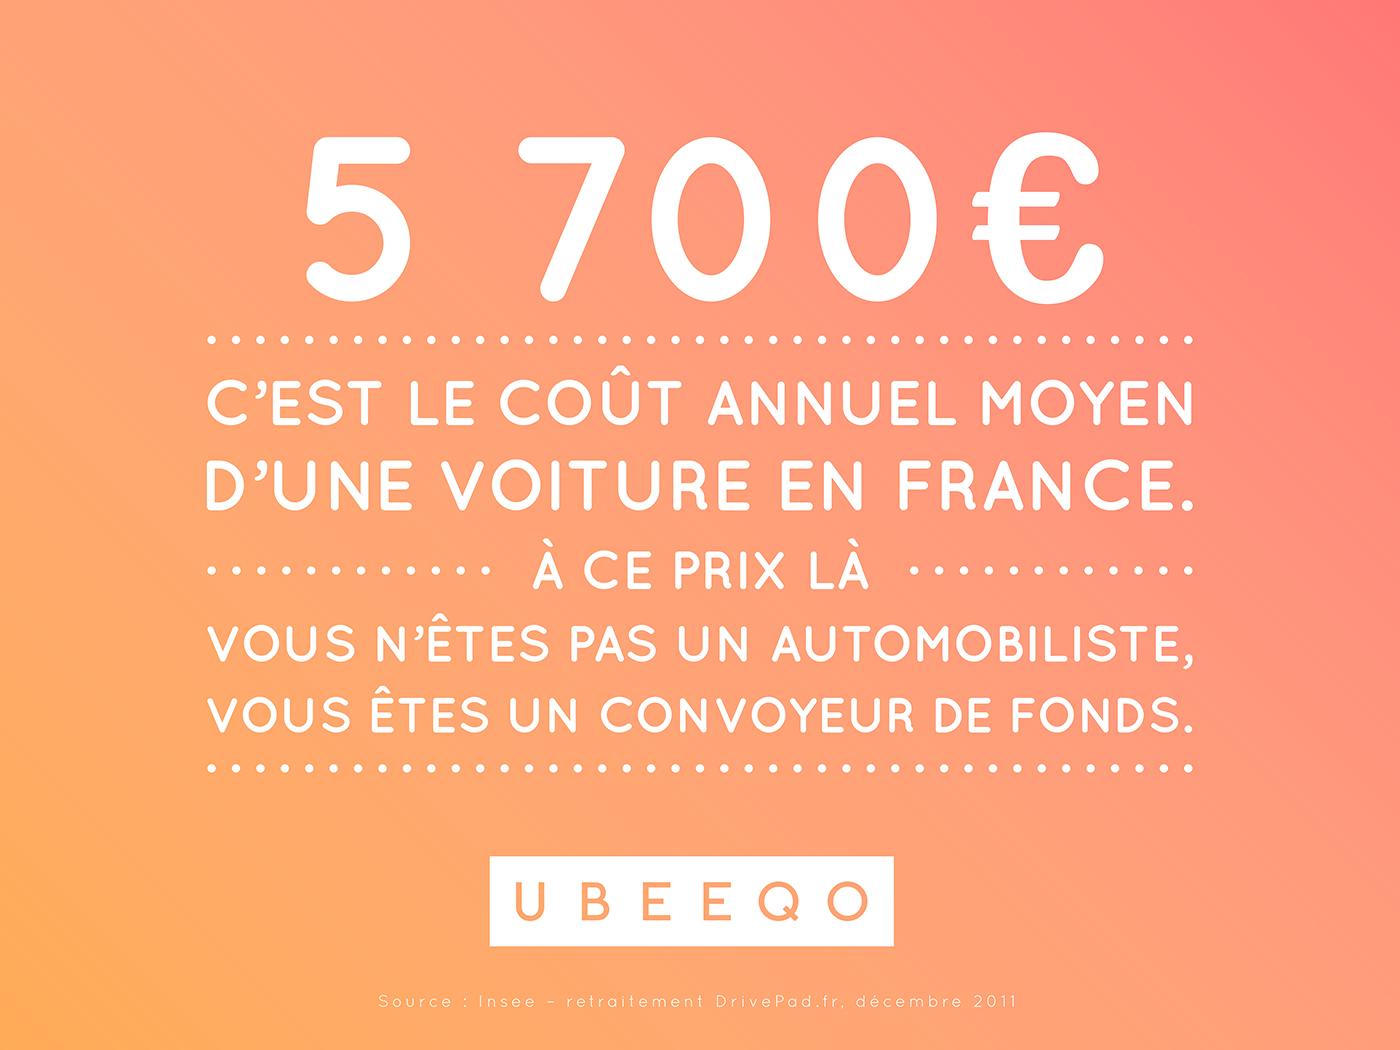 ubeeqo-application-automobile-partage-paris-chiffres-absurdes-publicite-marketing-stunt-2016-agence-clm-bbdo